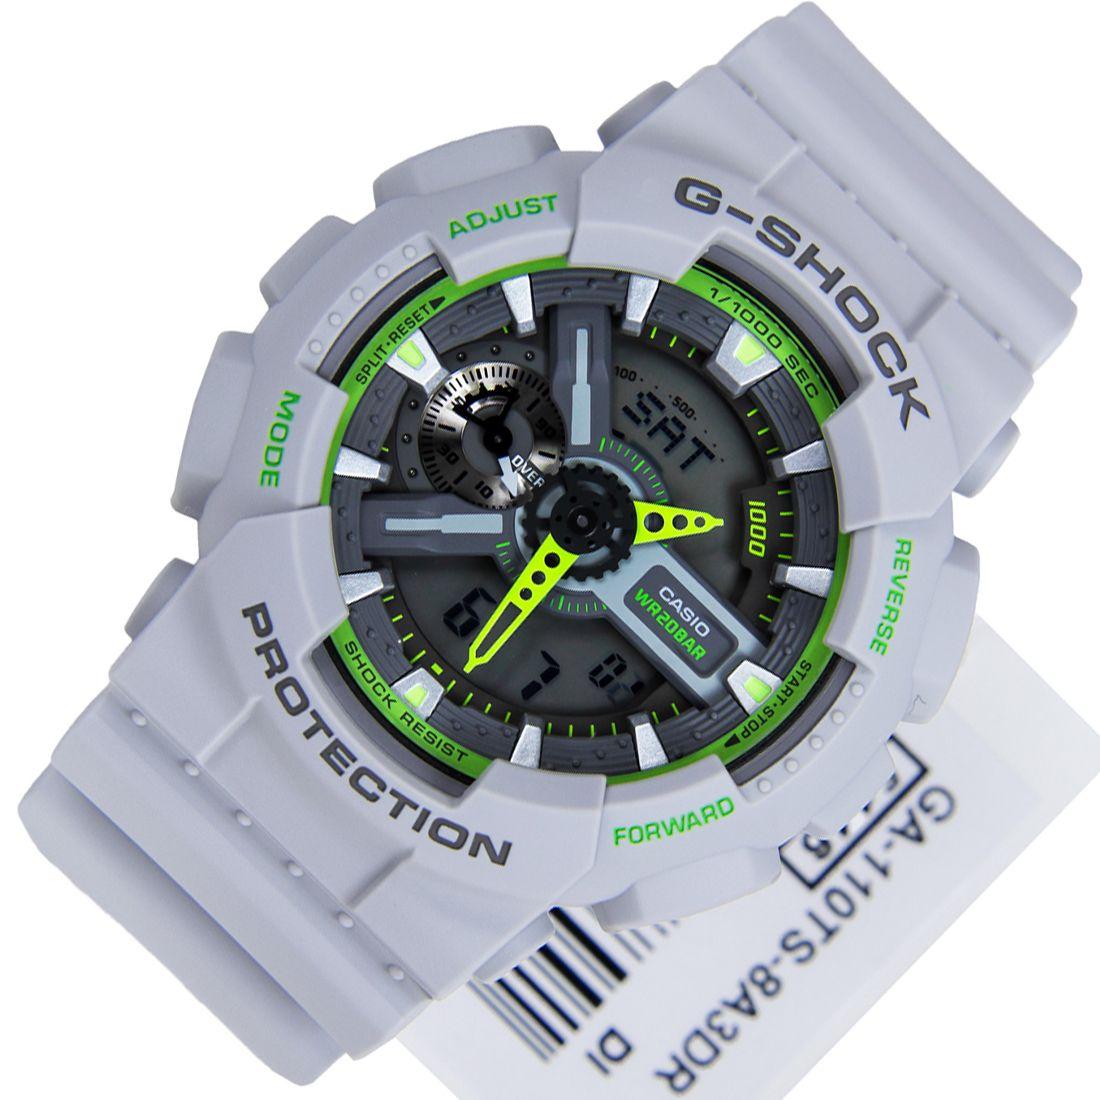 Casio G Shock Ga 110ts 8a3dr Casio G Shock Casio G Shock